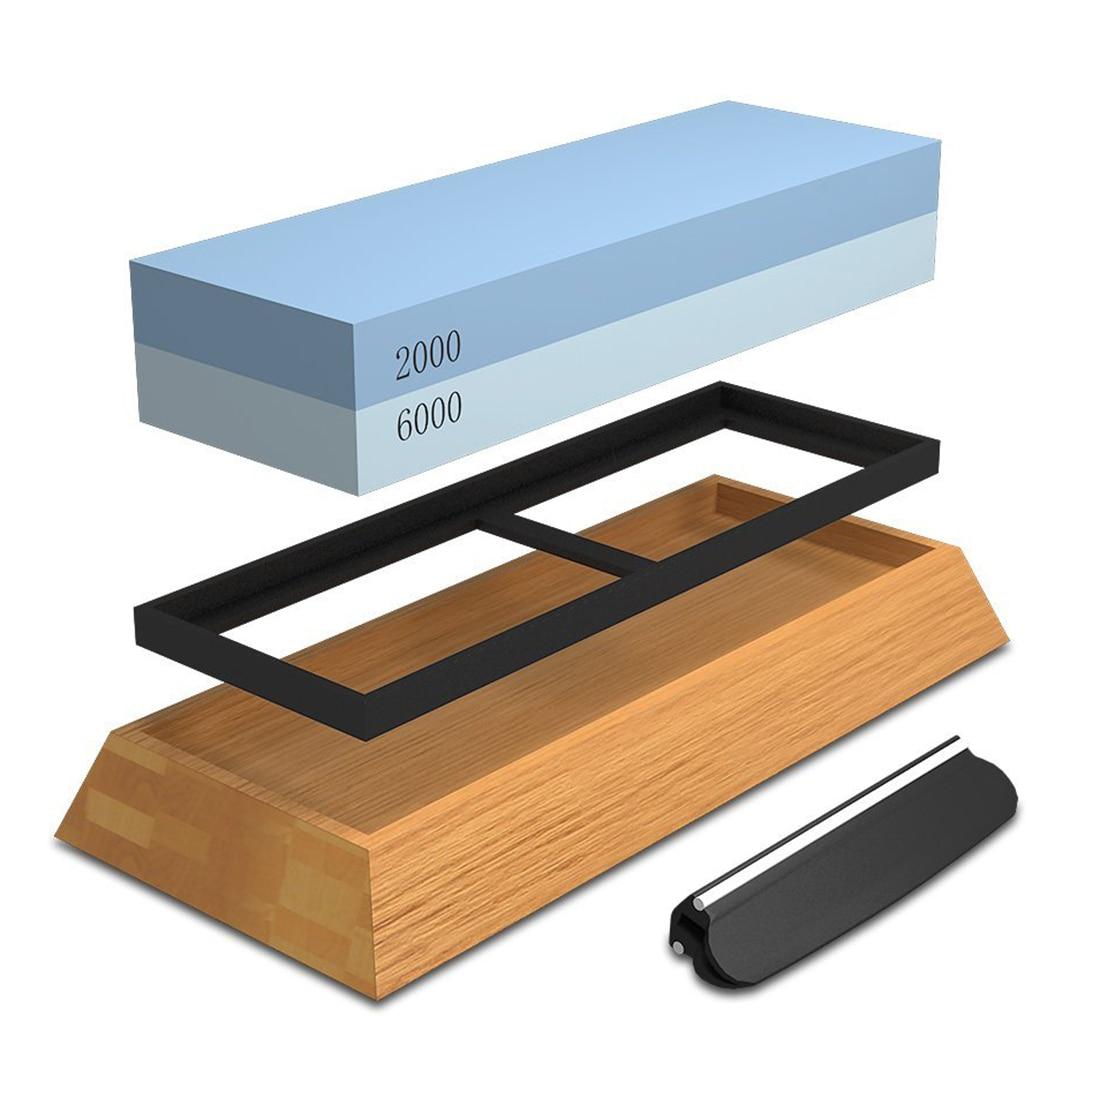 messer sch rfen anleitung smartstore. Black Bedroom Furniture Sets. Home Design Ideas